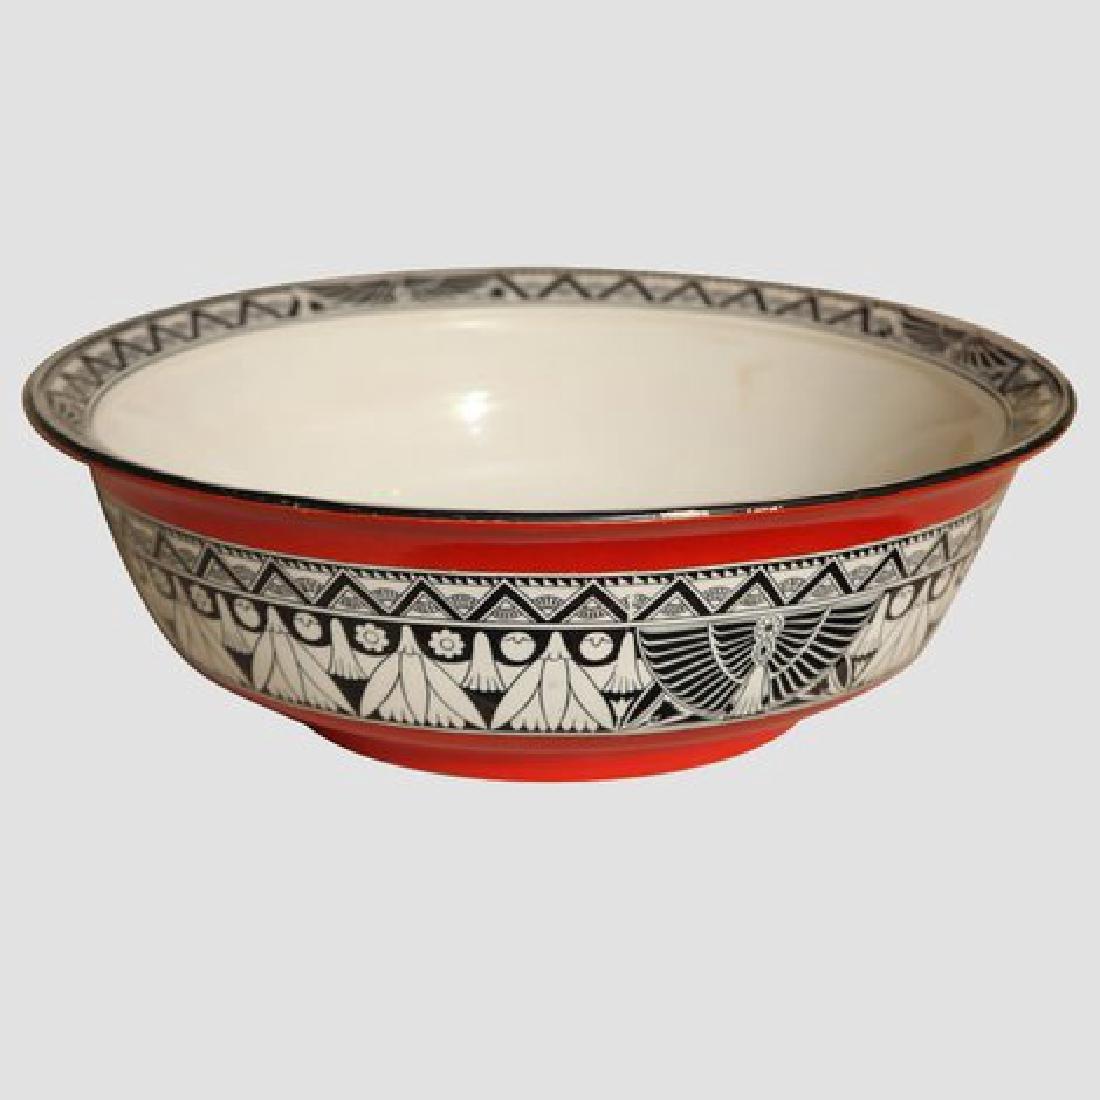 Coronaware Bowl